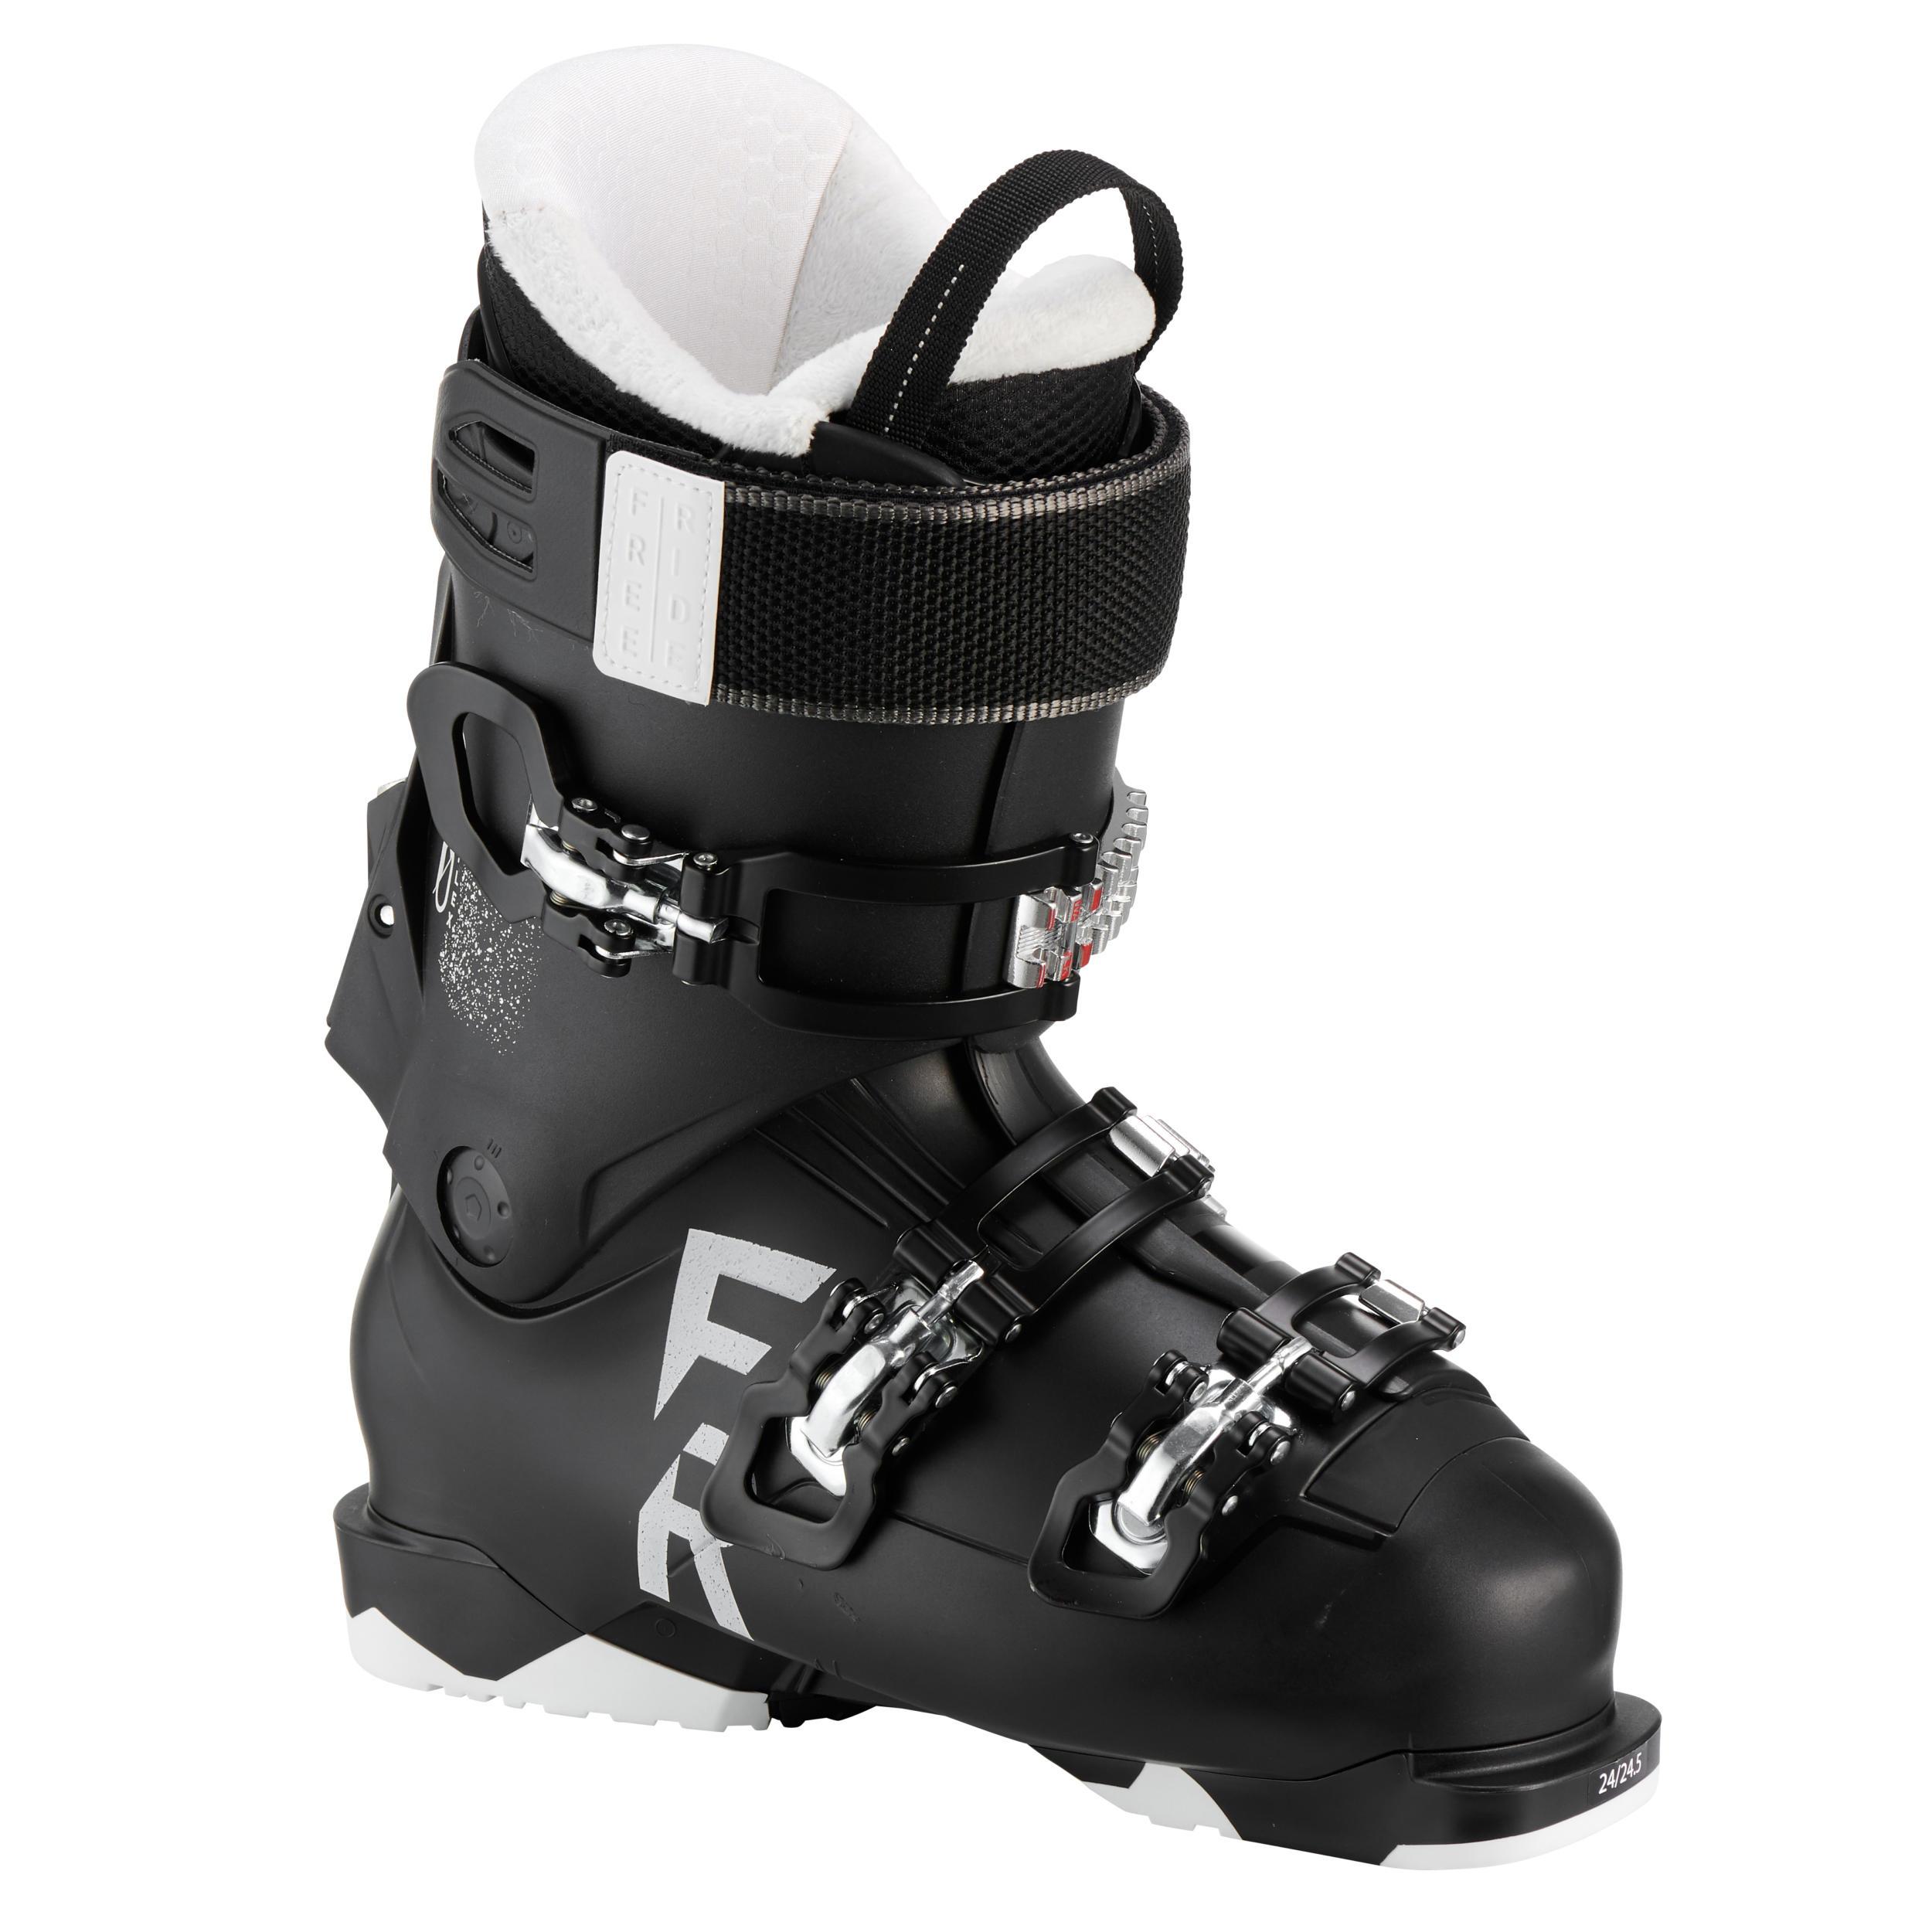 Clăpari schi FR 100 FLEX 80 imagine